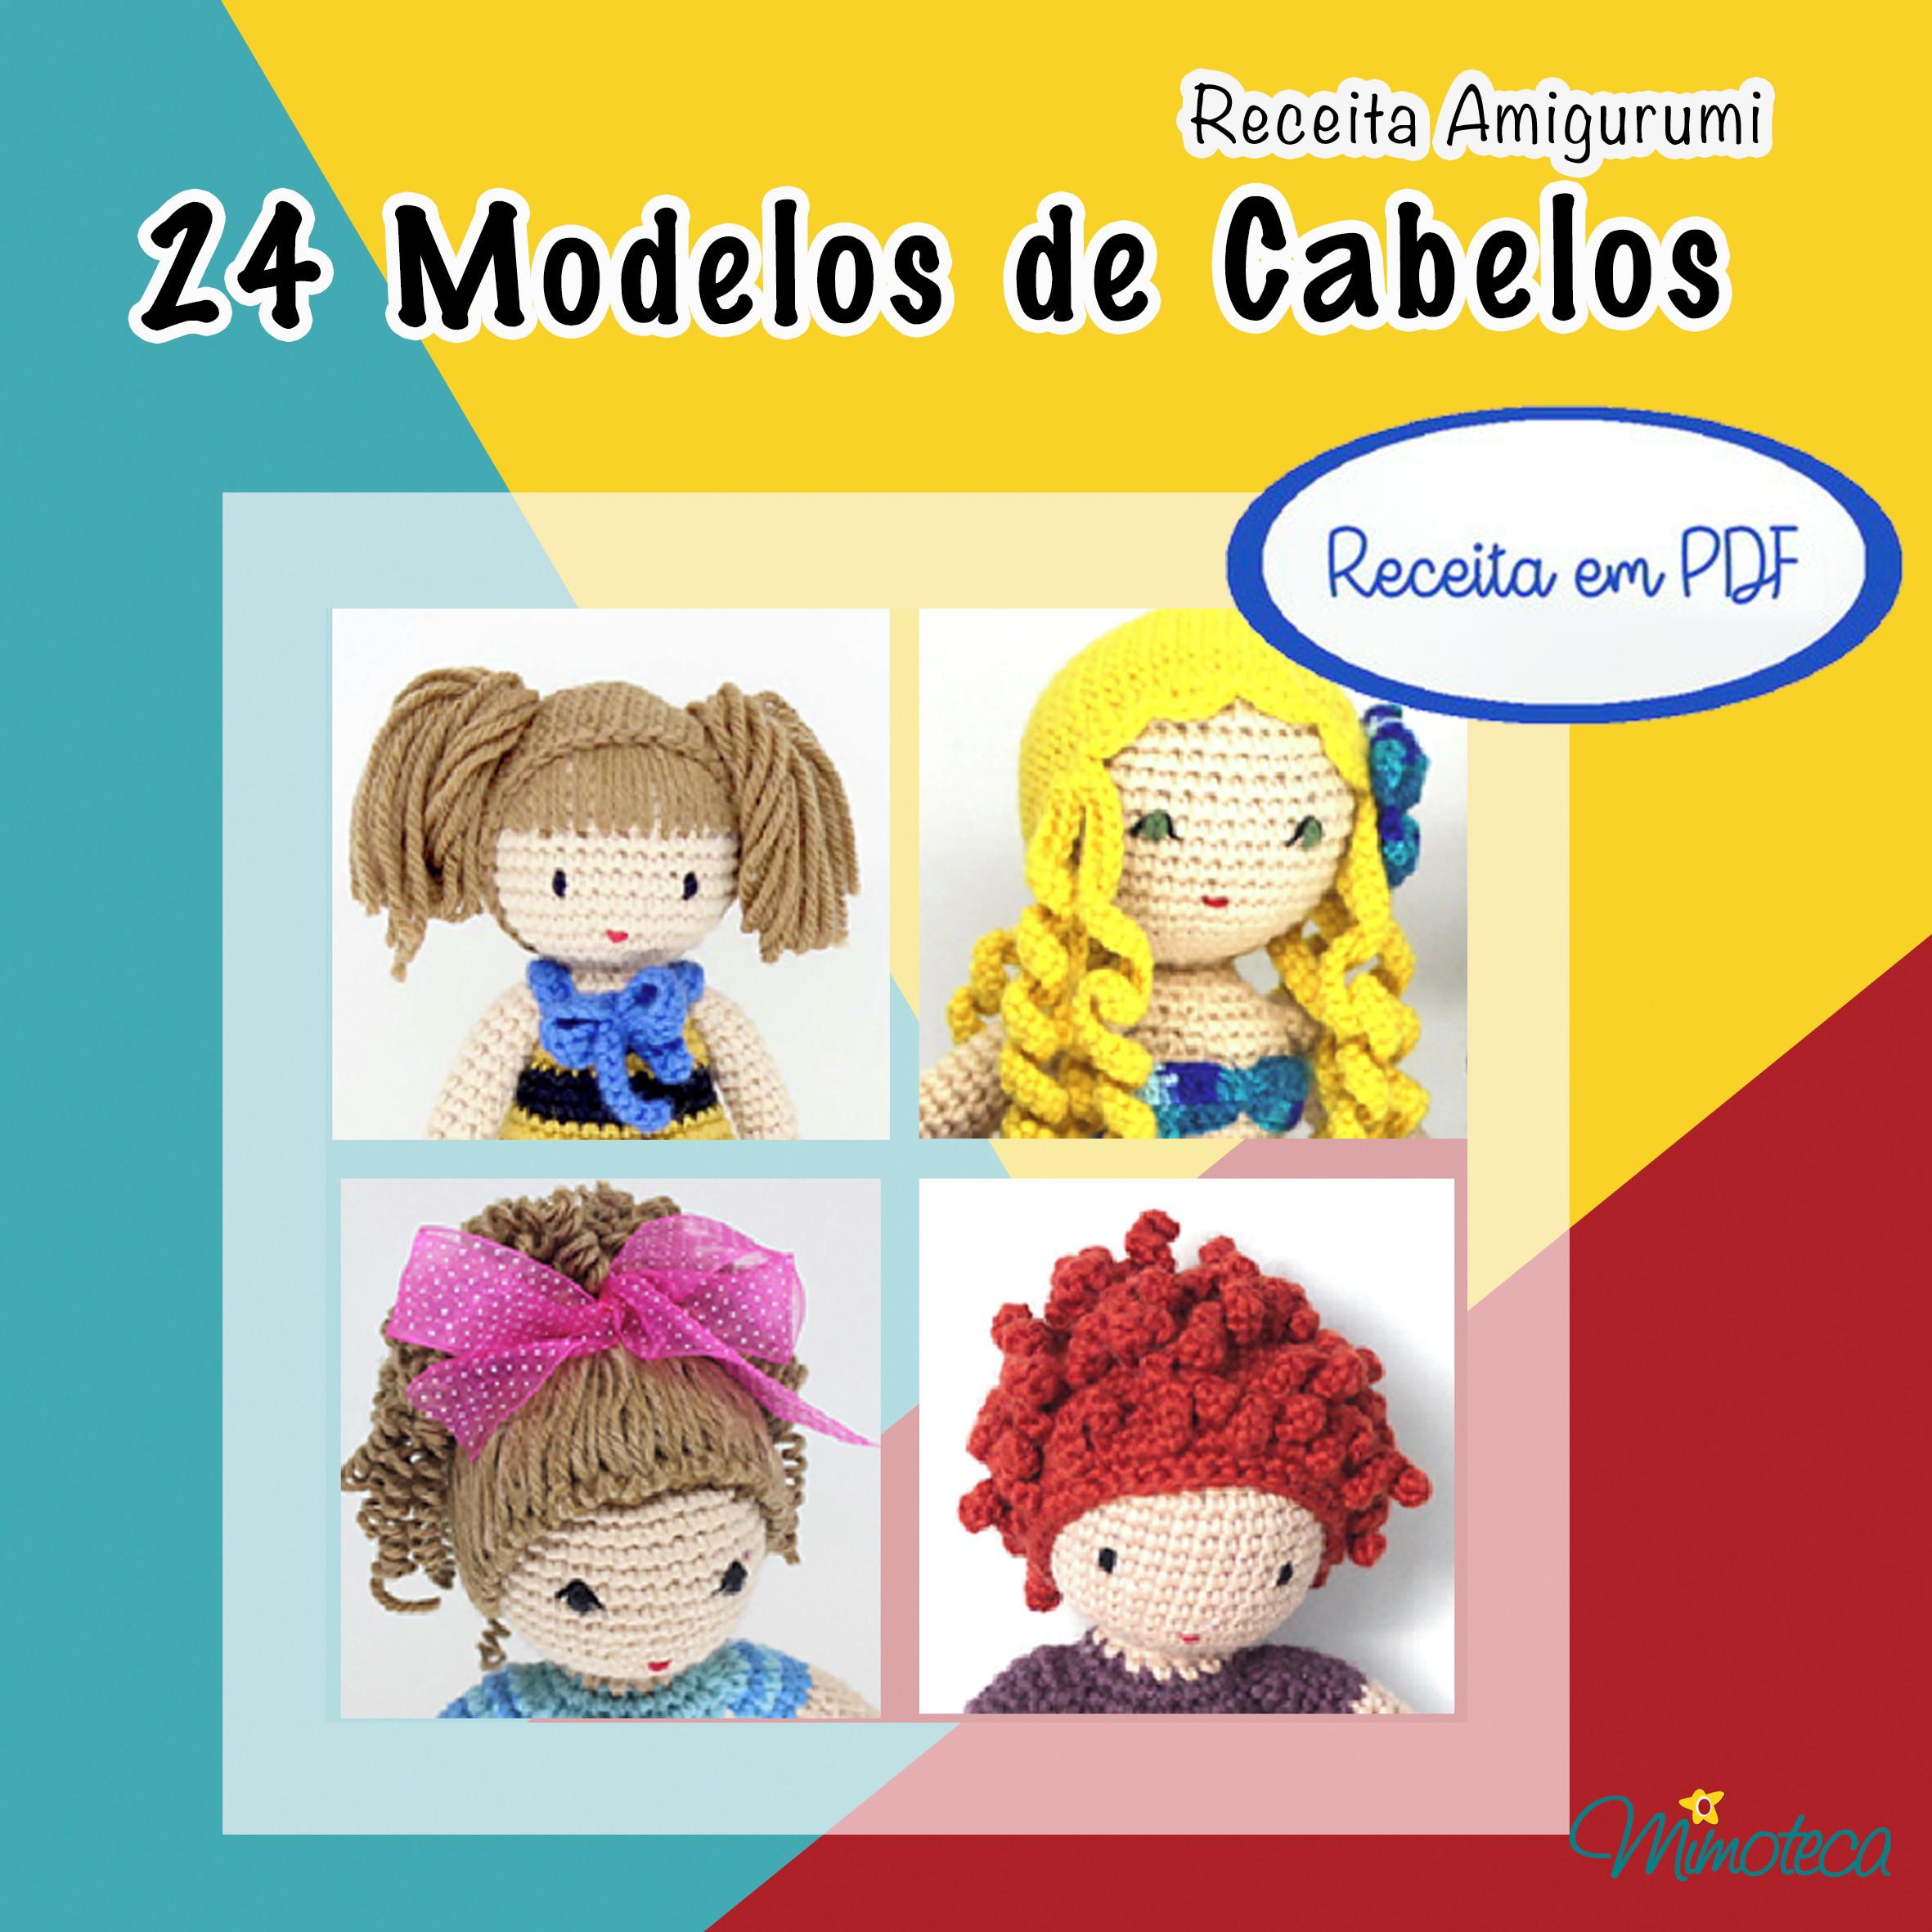 Amazon.com: Amigos Fofinhos Amigurumi Receita de Crochet (Receitas ... | 2362x2362